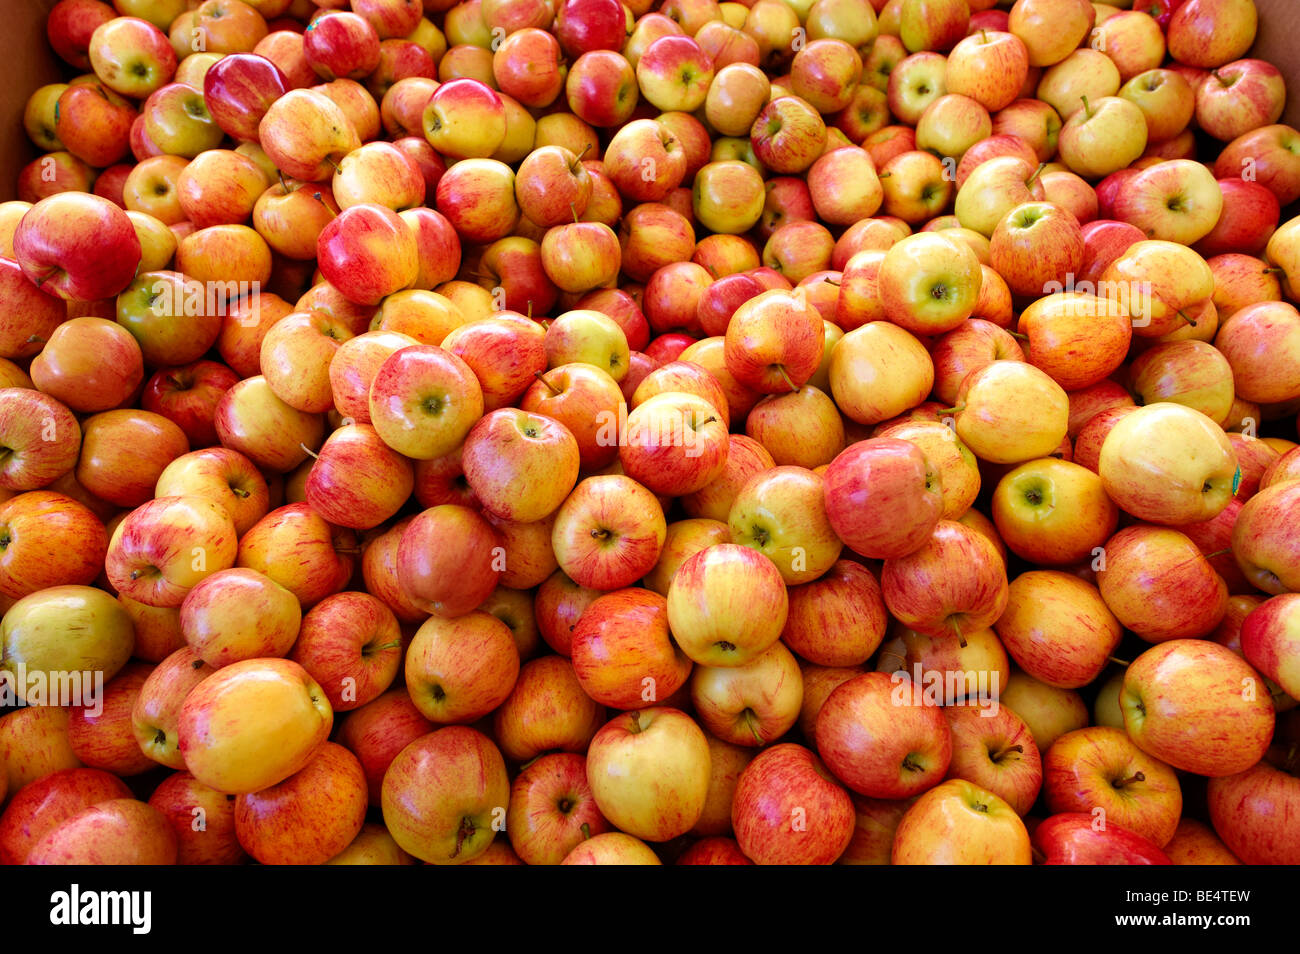 Fresh apples at market - Stock Image